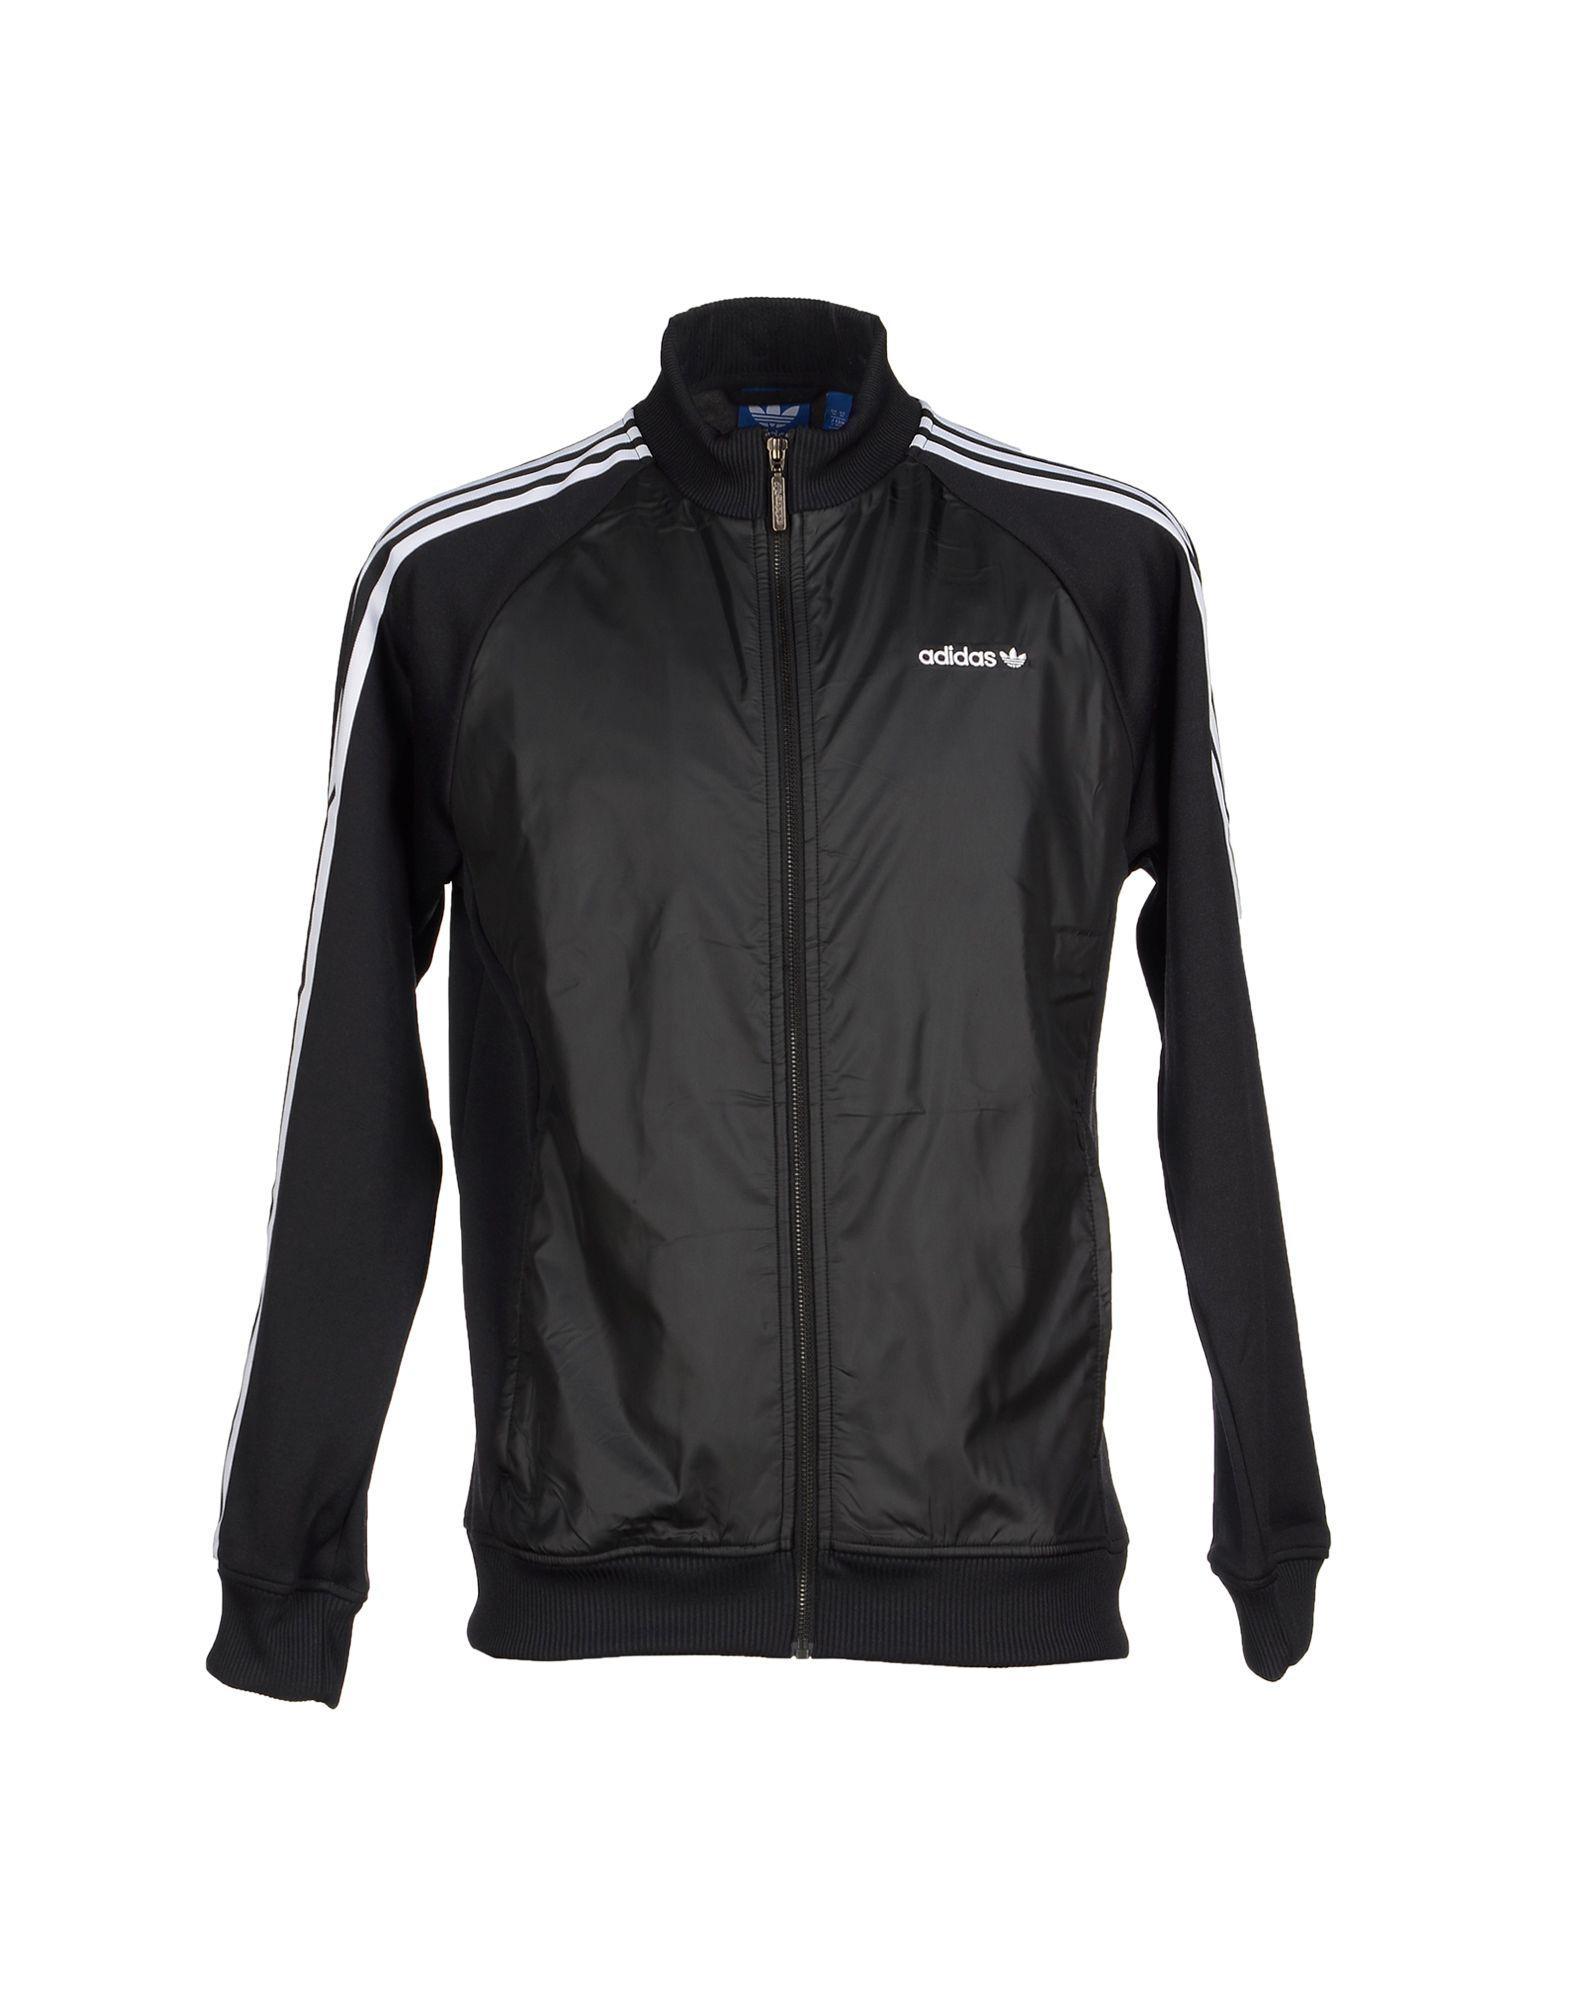 Lyst - Adidas Originals Jacket in Black for Men